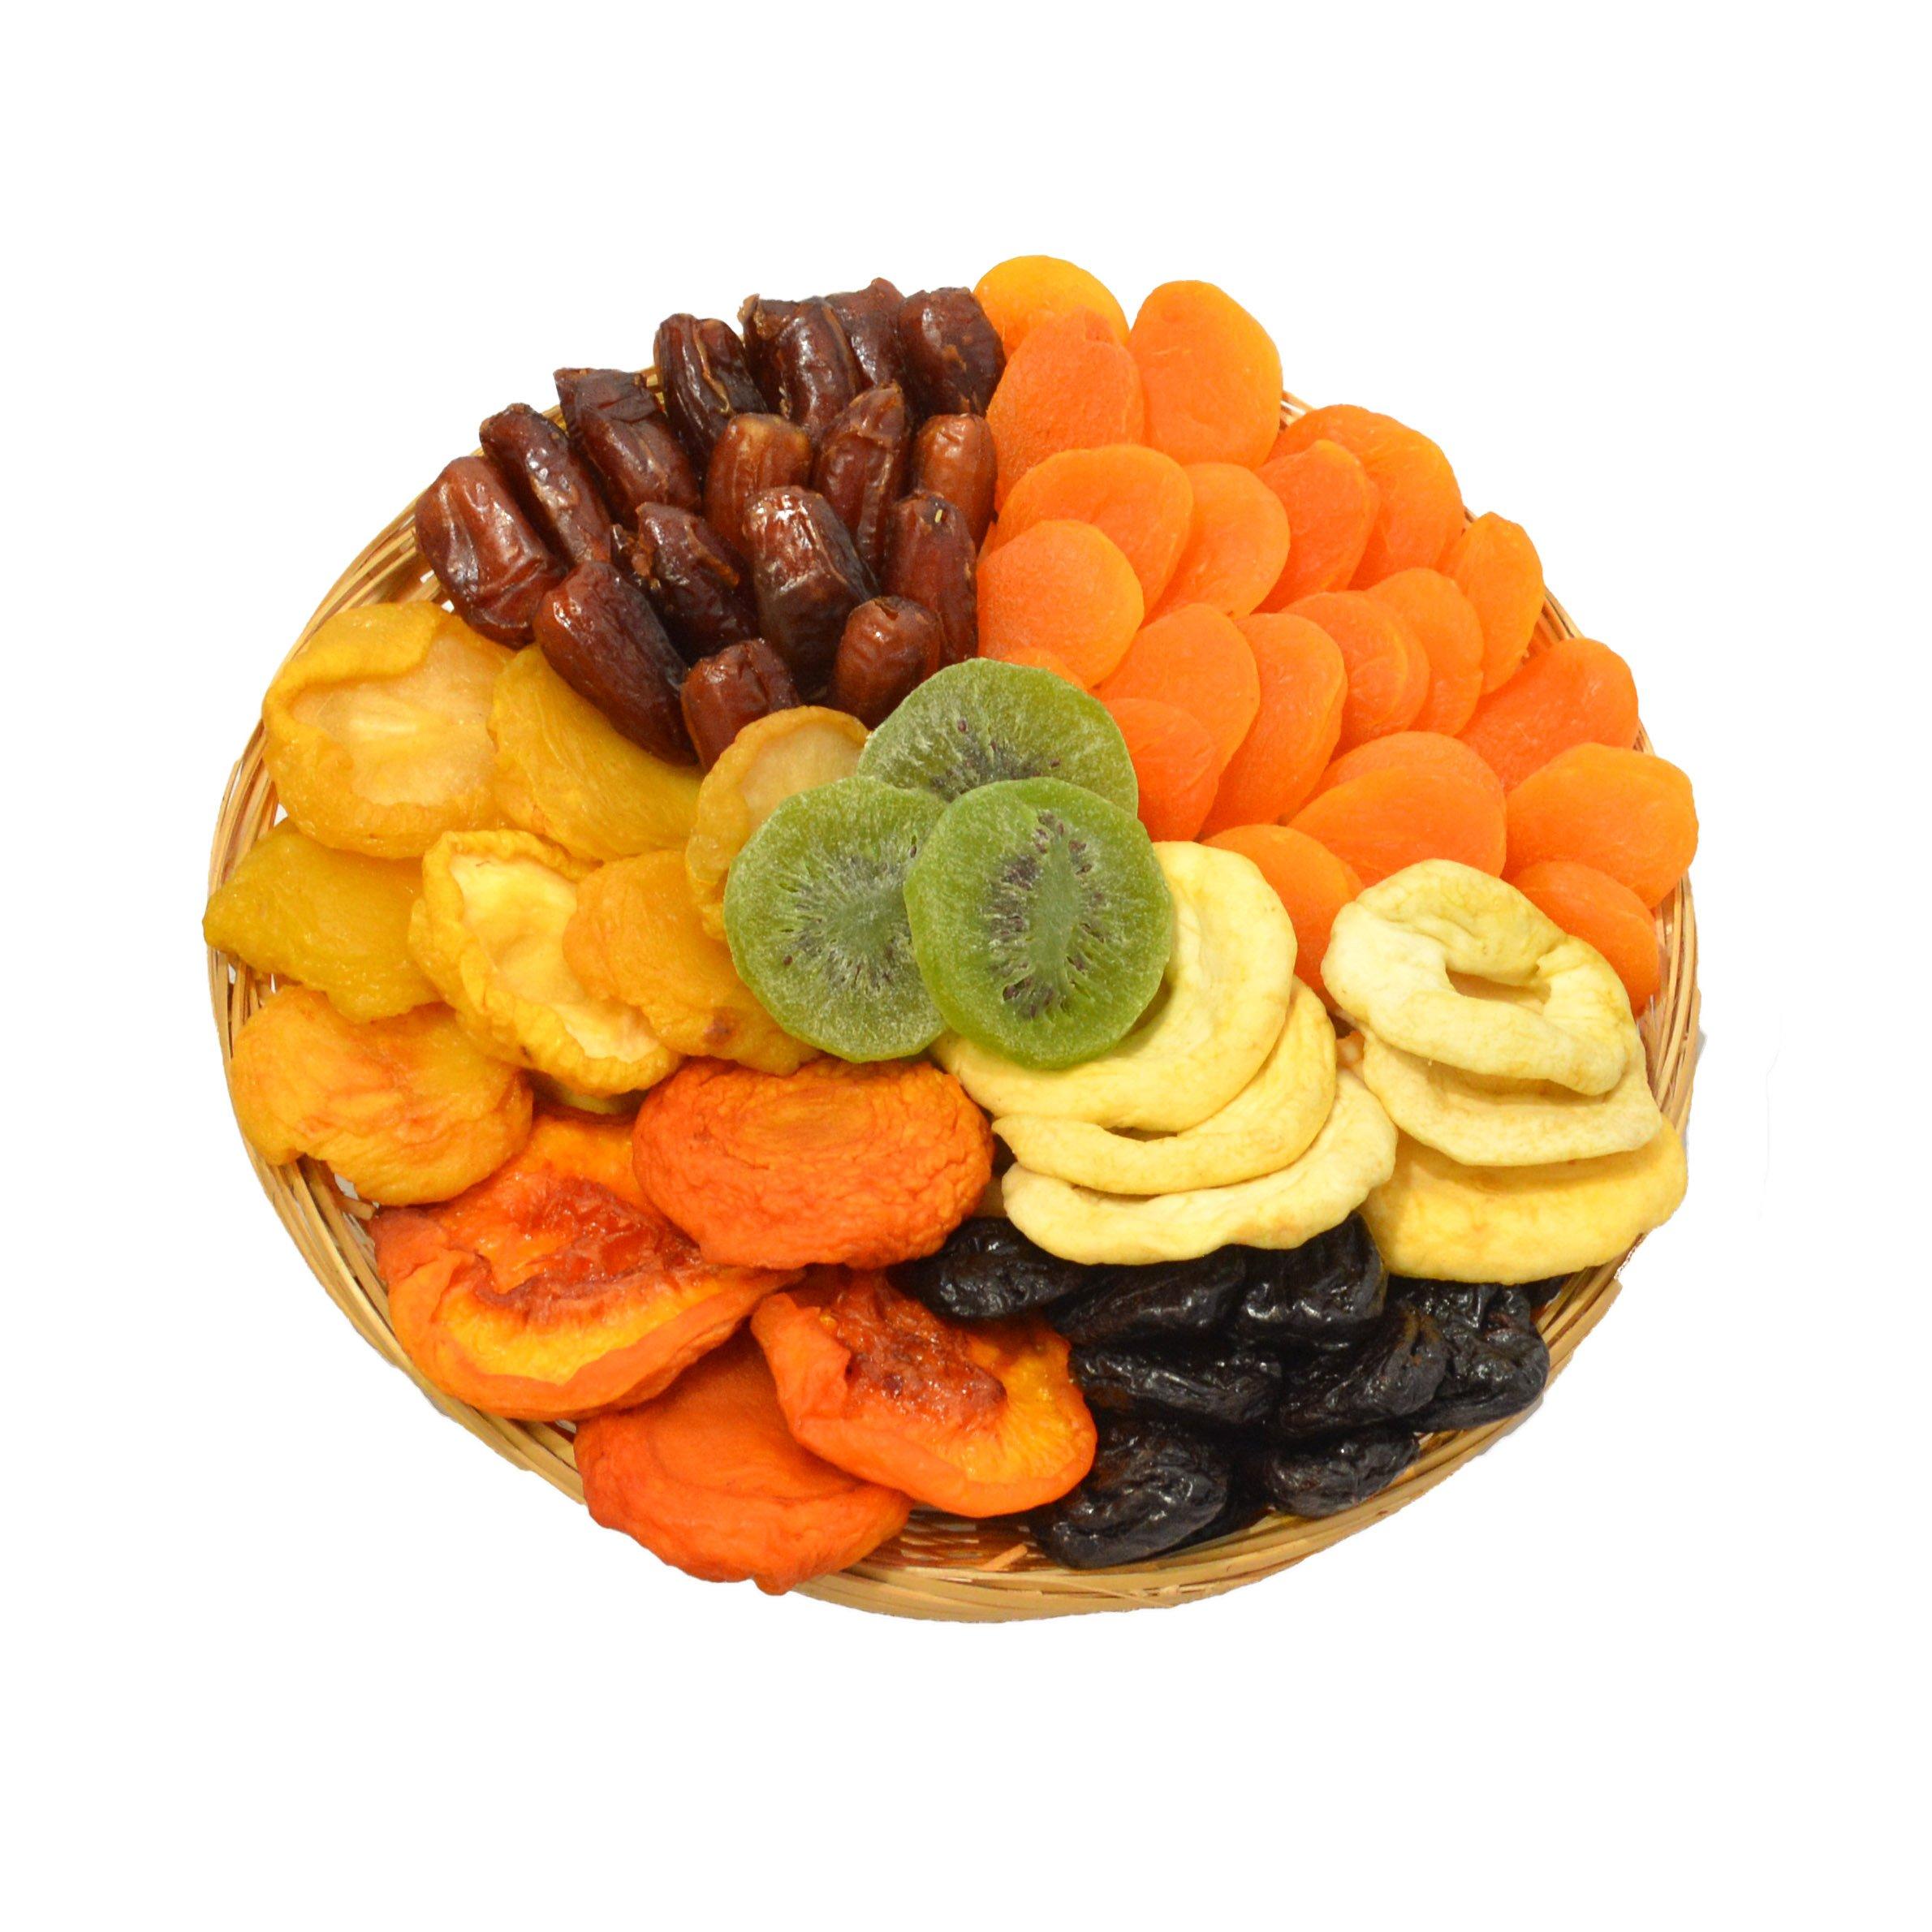 Sympathy Healthy Dried Fruit Elegante by Broadway Basketeers ~ Kosher Gift Baskets